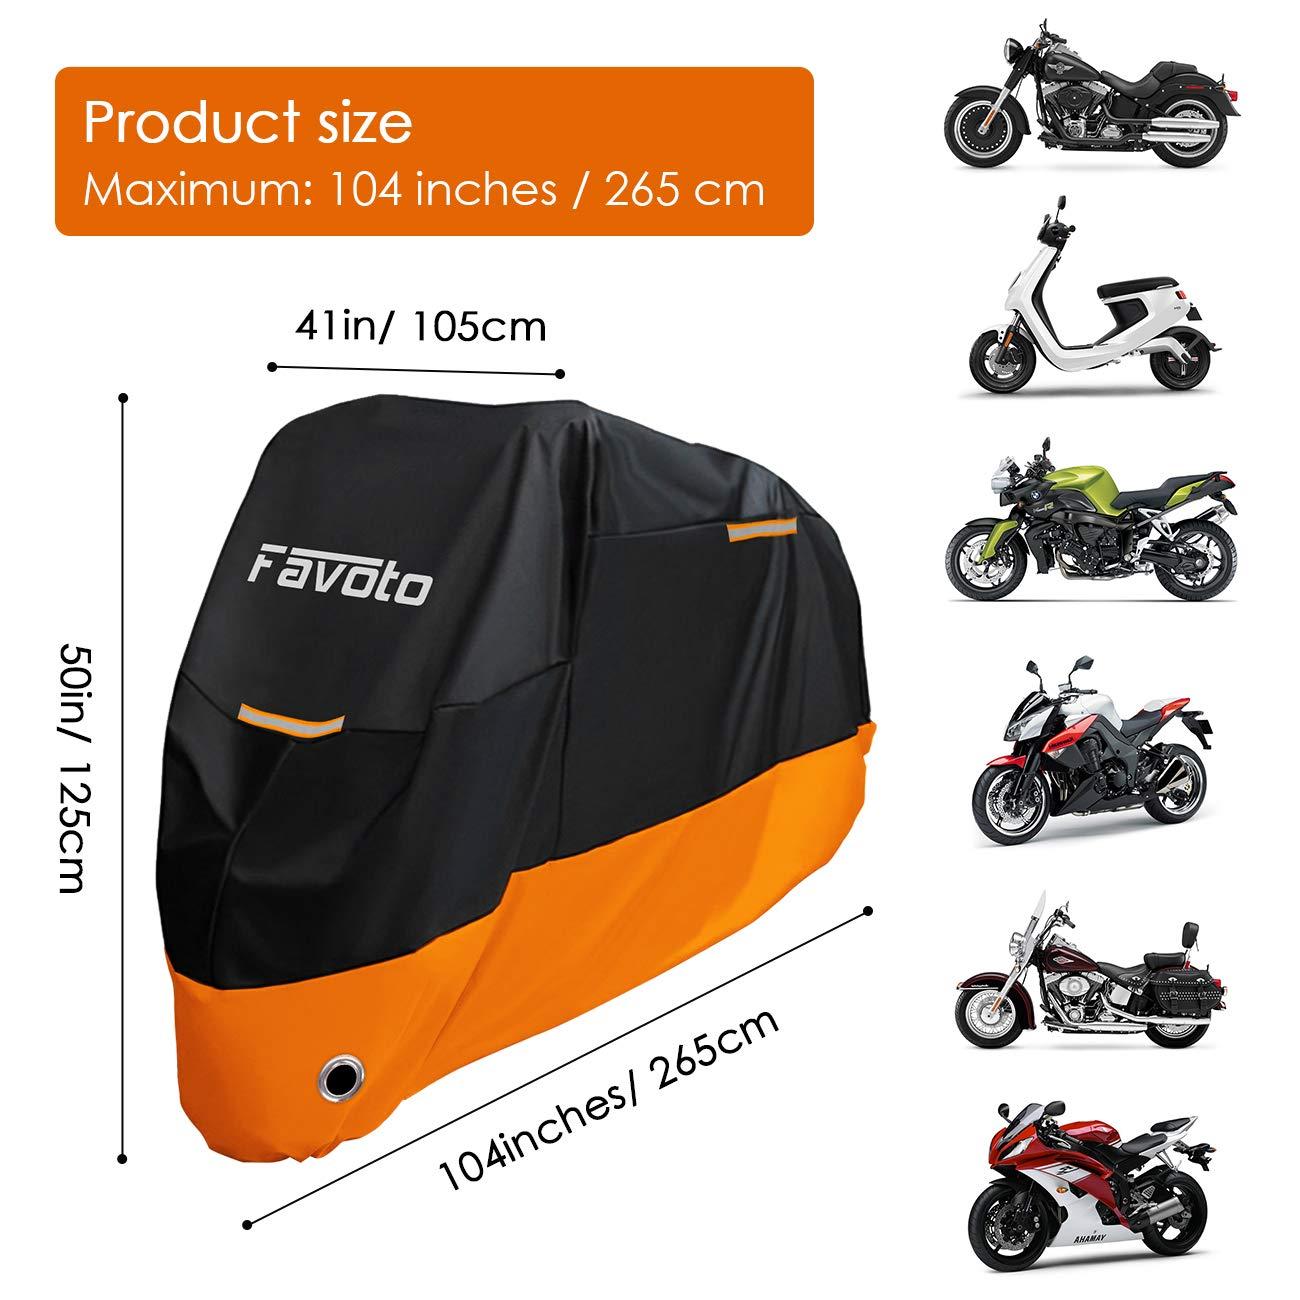 01b55b1f48f Favoto Funda para Moto 210D Cubierta de Motocicleta Protector Poli/é ster  Resistente al Agua a Prueba de UV Lluvia Polvo ...